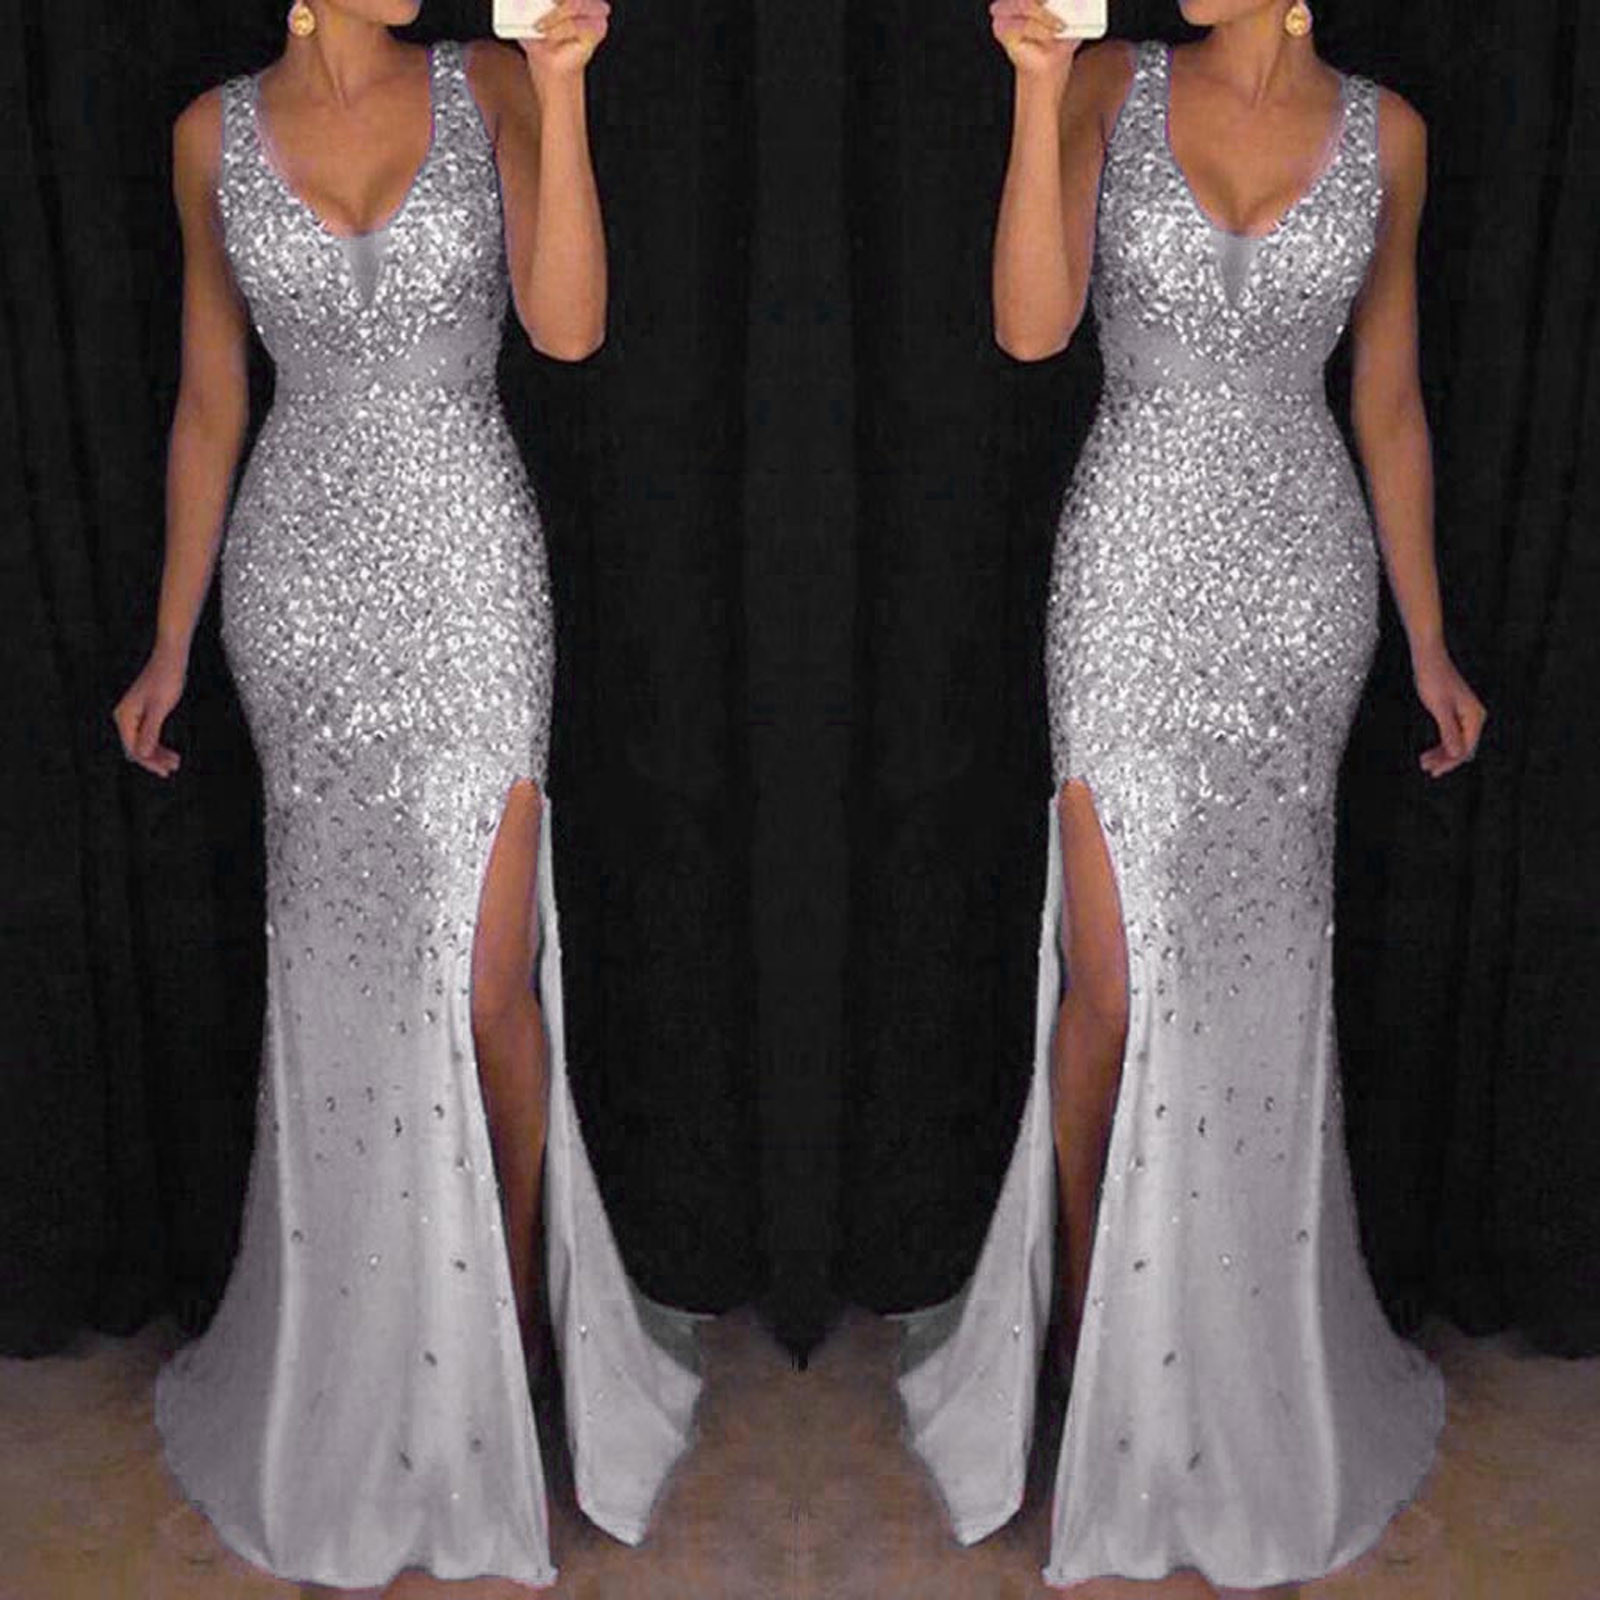 4# Women Sequin Dresses Prom Party Ball Gown Sexy Gold Evening Bridesmaid V Neck Long Dress Spaghetti Strap Dresses Sukienka